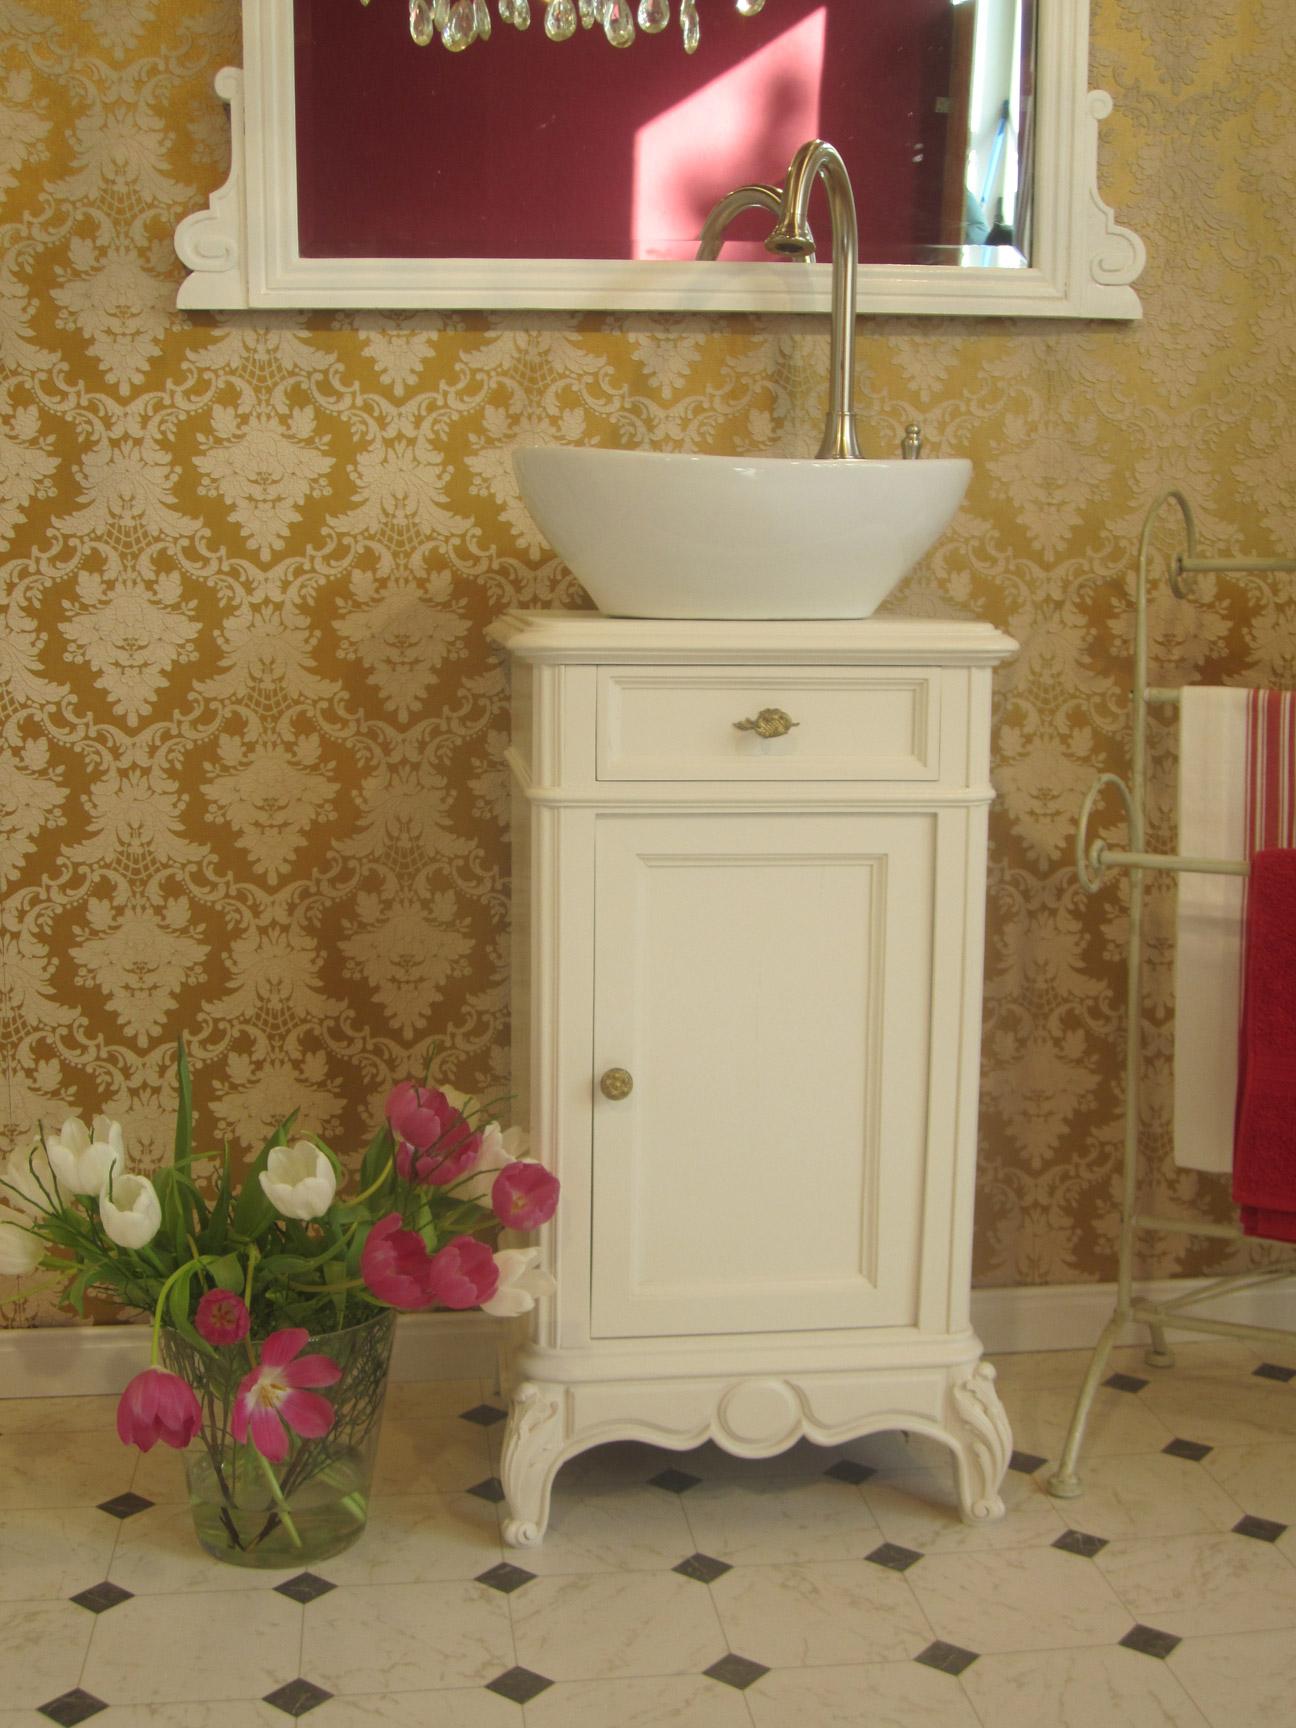 Waschtisch antik küche  Waschtisch Antik | gispatcher.com